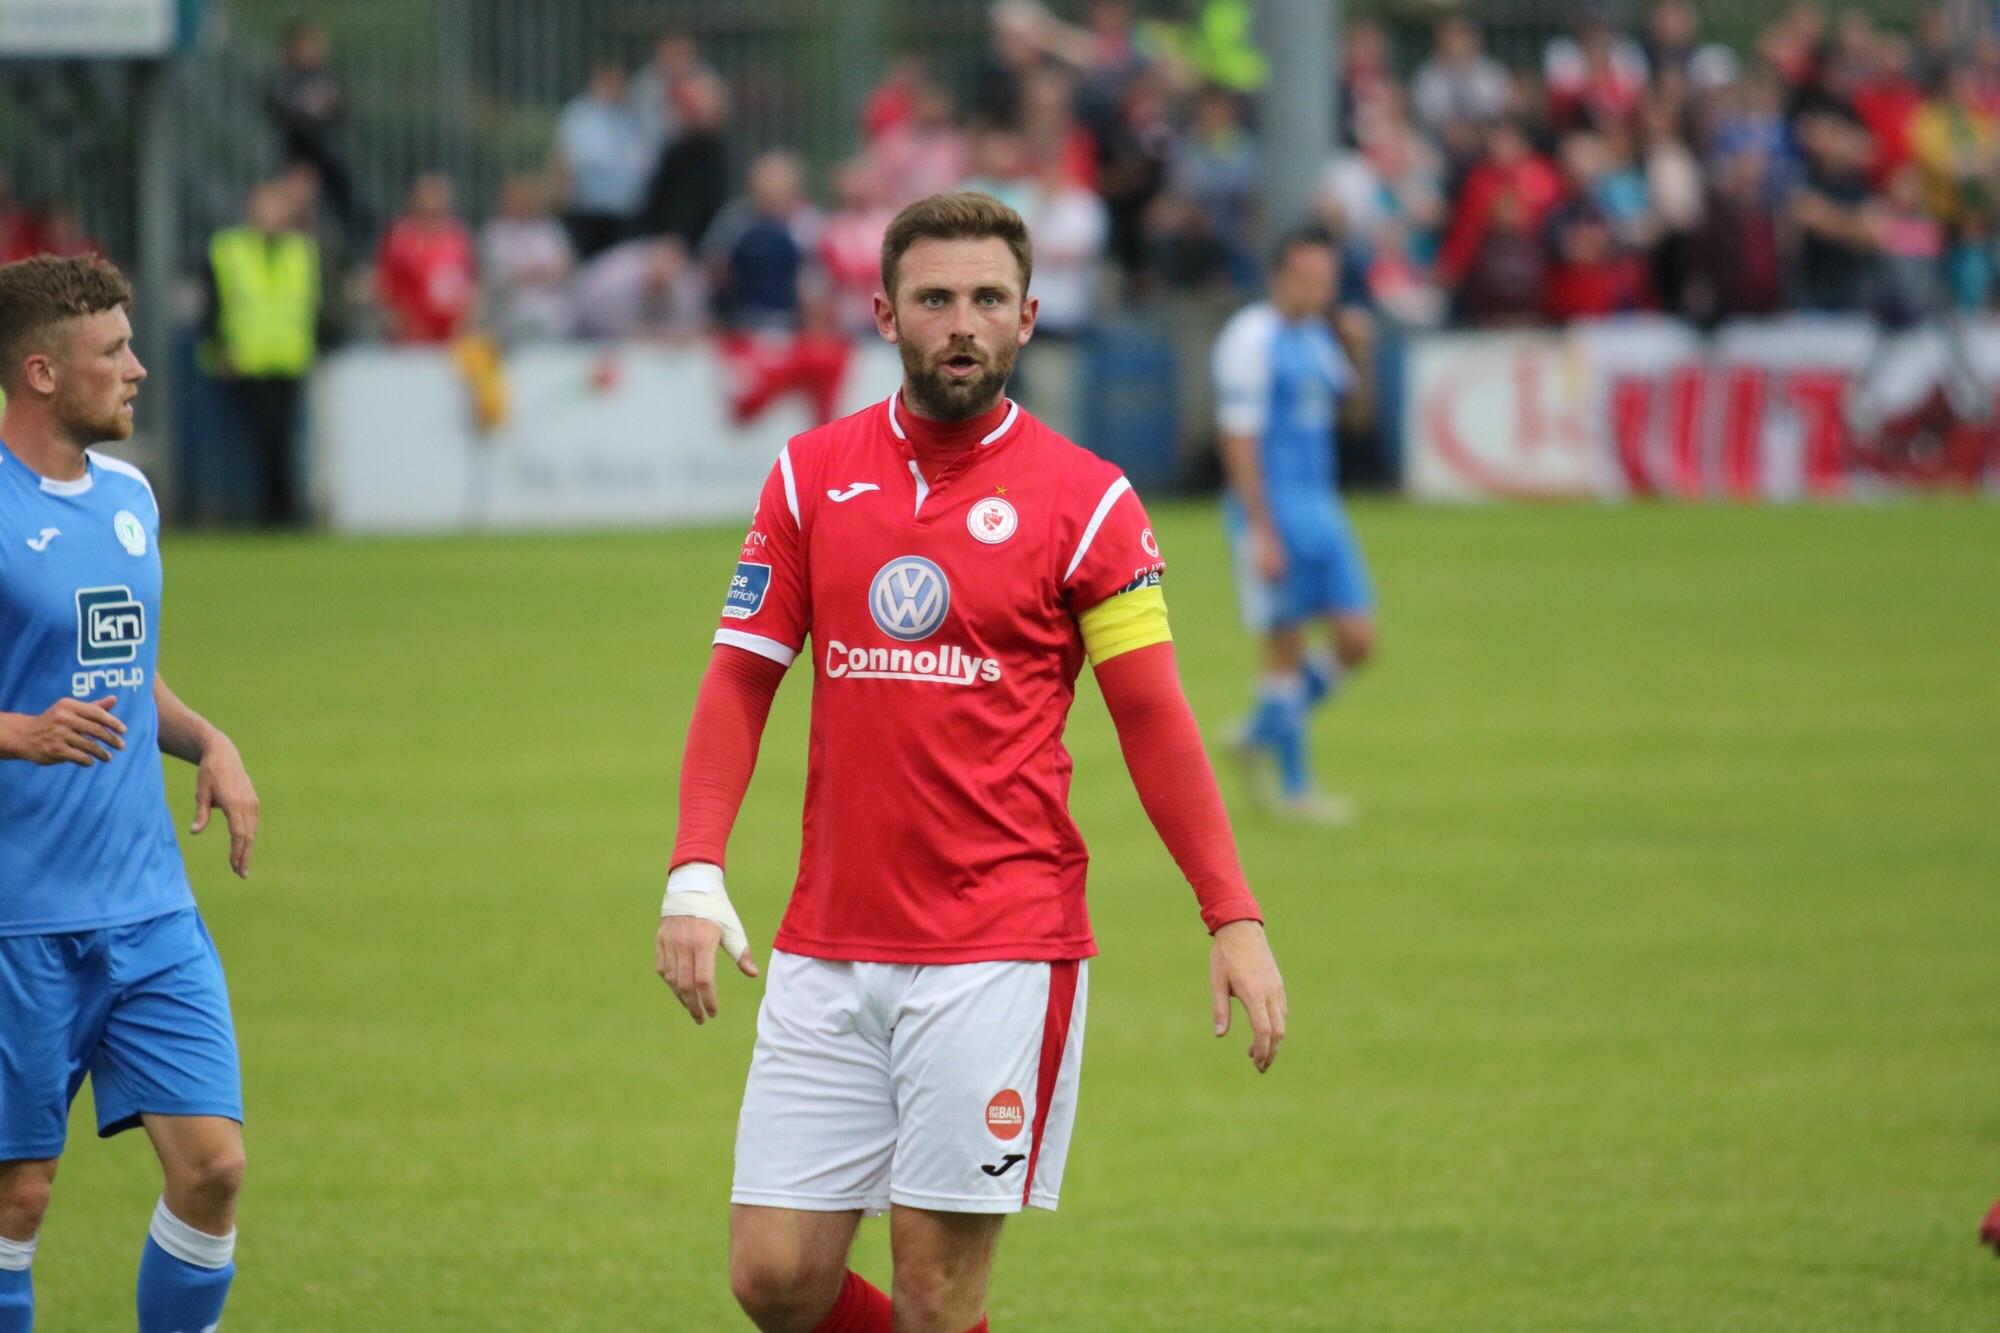 Kyle McFadden, Ramelton, Highland Radio Sport, Letterkenny, Donegal